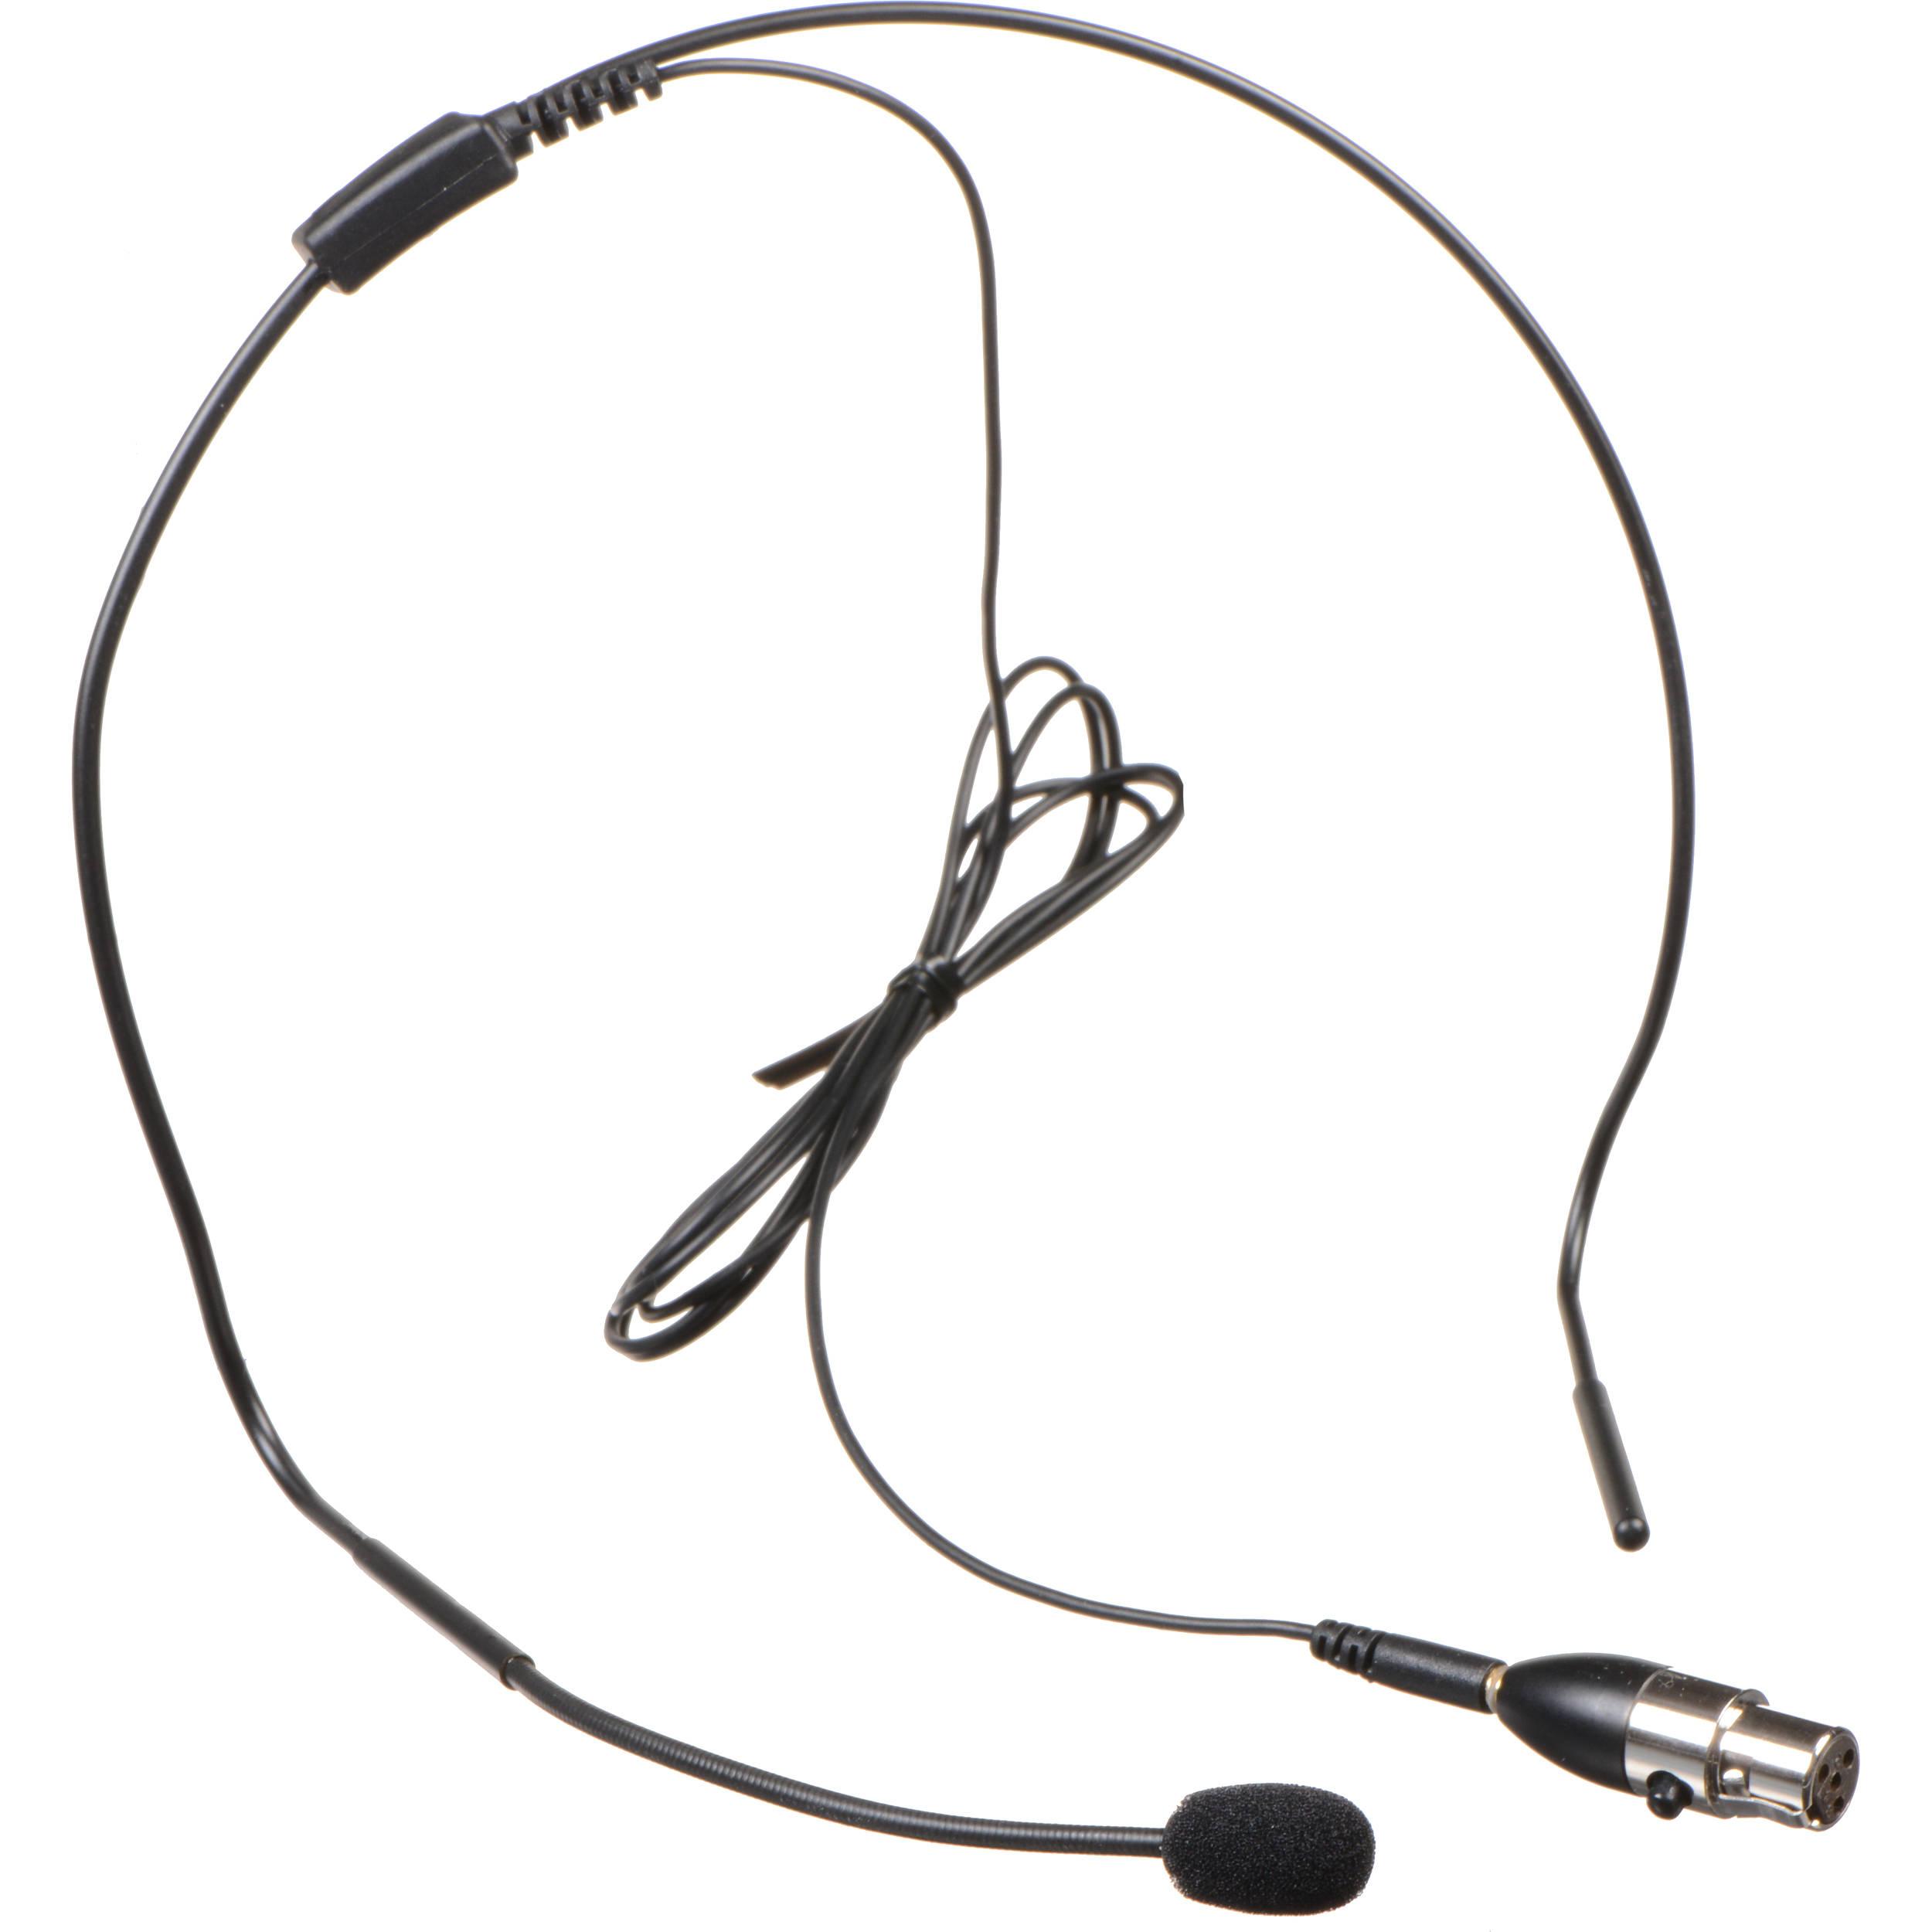 audix ht5 headworn microphone with 4 pin mini xlr ht5 4pin b h Accessories Wiring Diagram audix ht5 headworn microphone with 4 pin mini xlr connector black